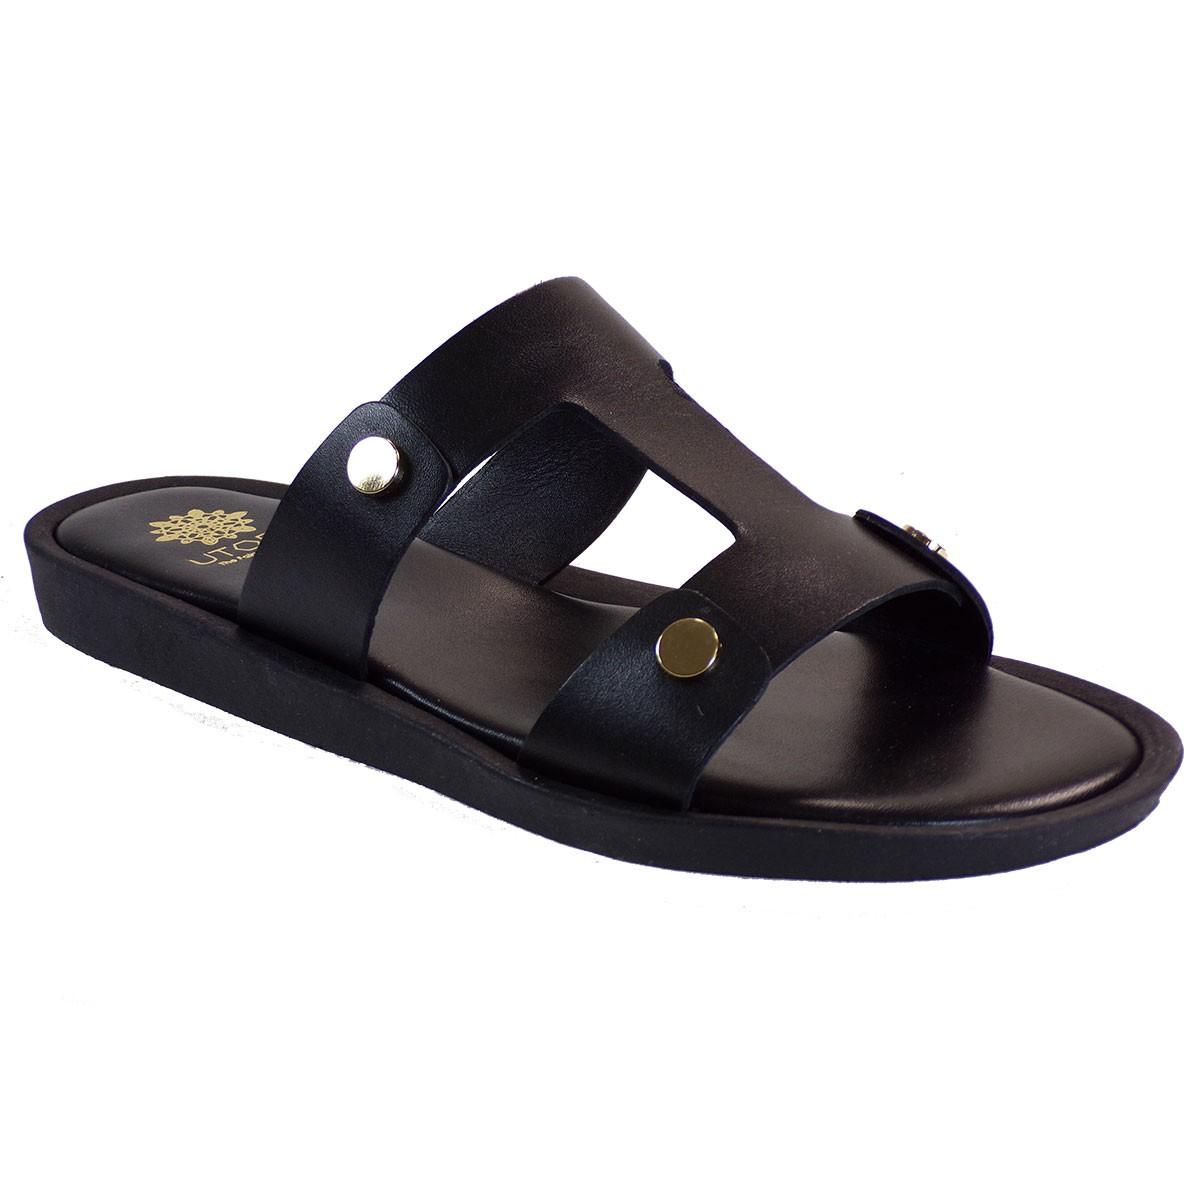 UTOPIA Γυναικεία Παπούτσια Παντόφλες U3-006 Μαύρο Δέρμα